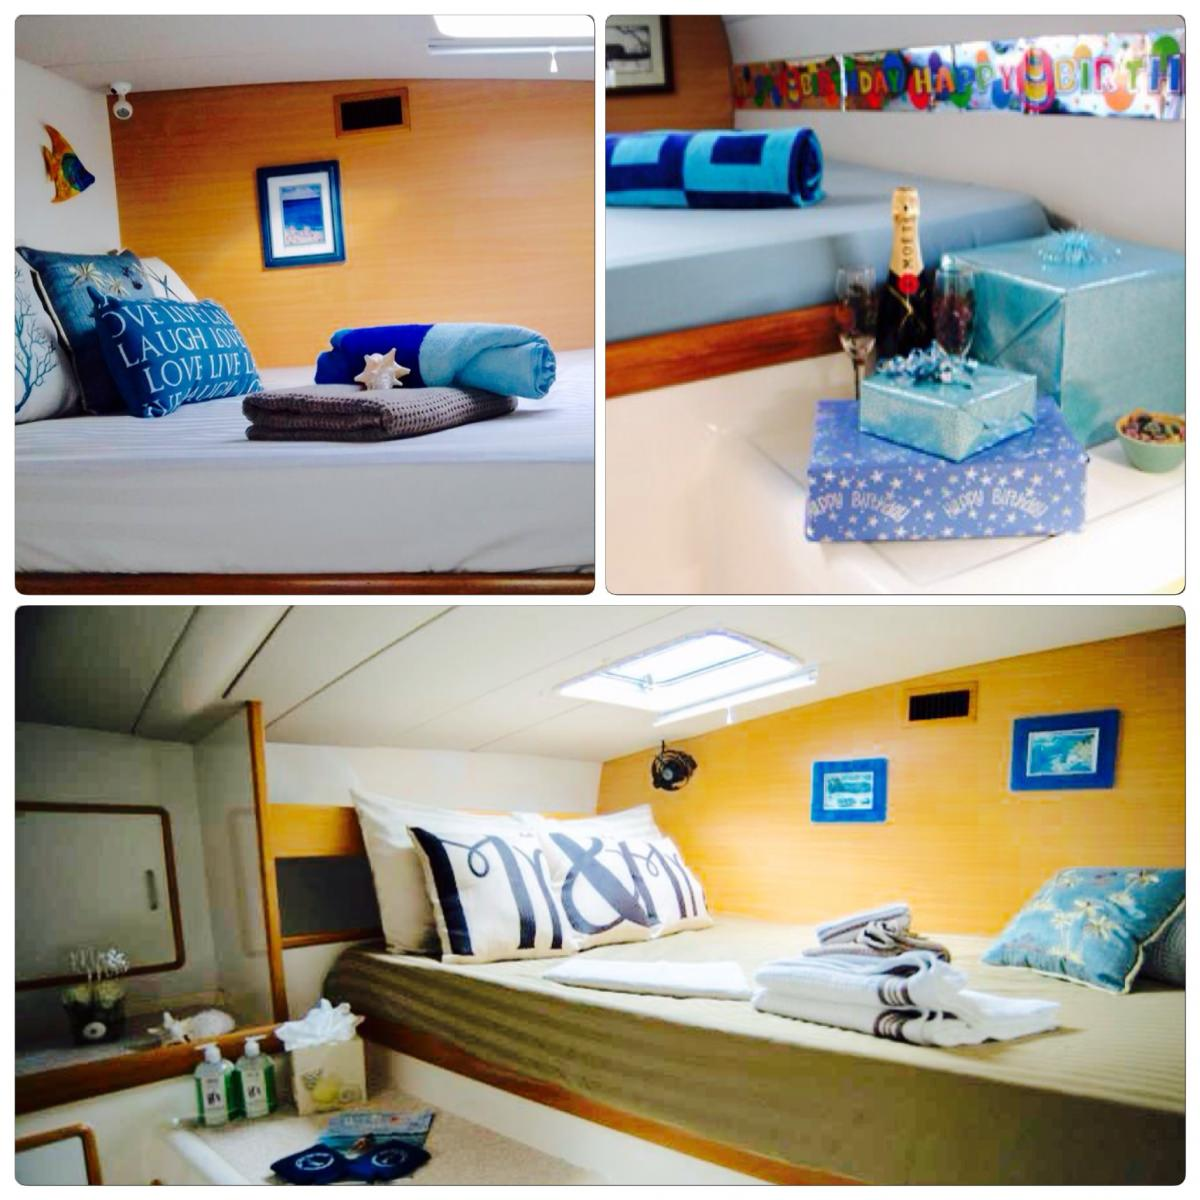 Free Ingwe Yacht Vacation